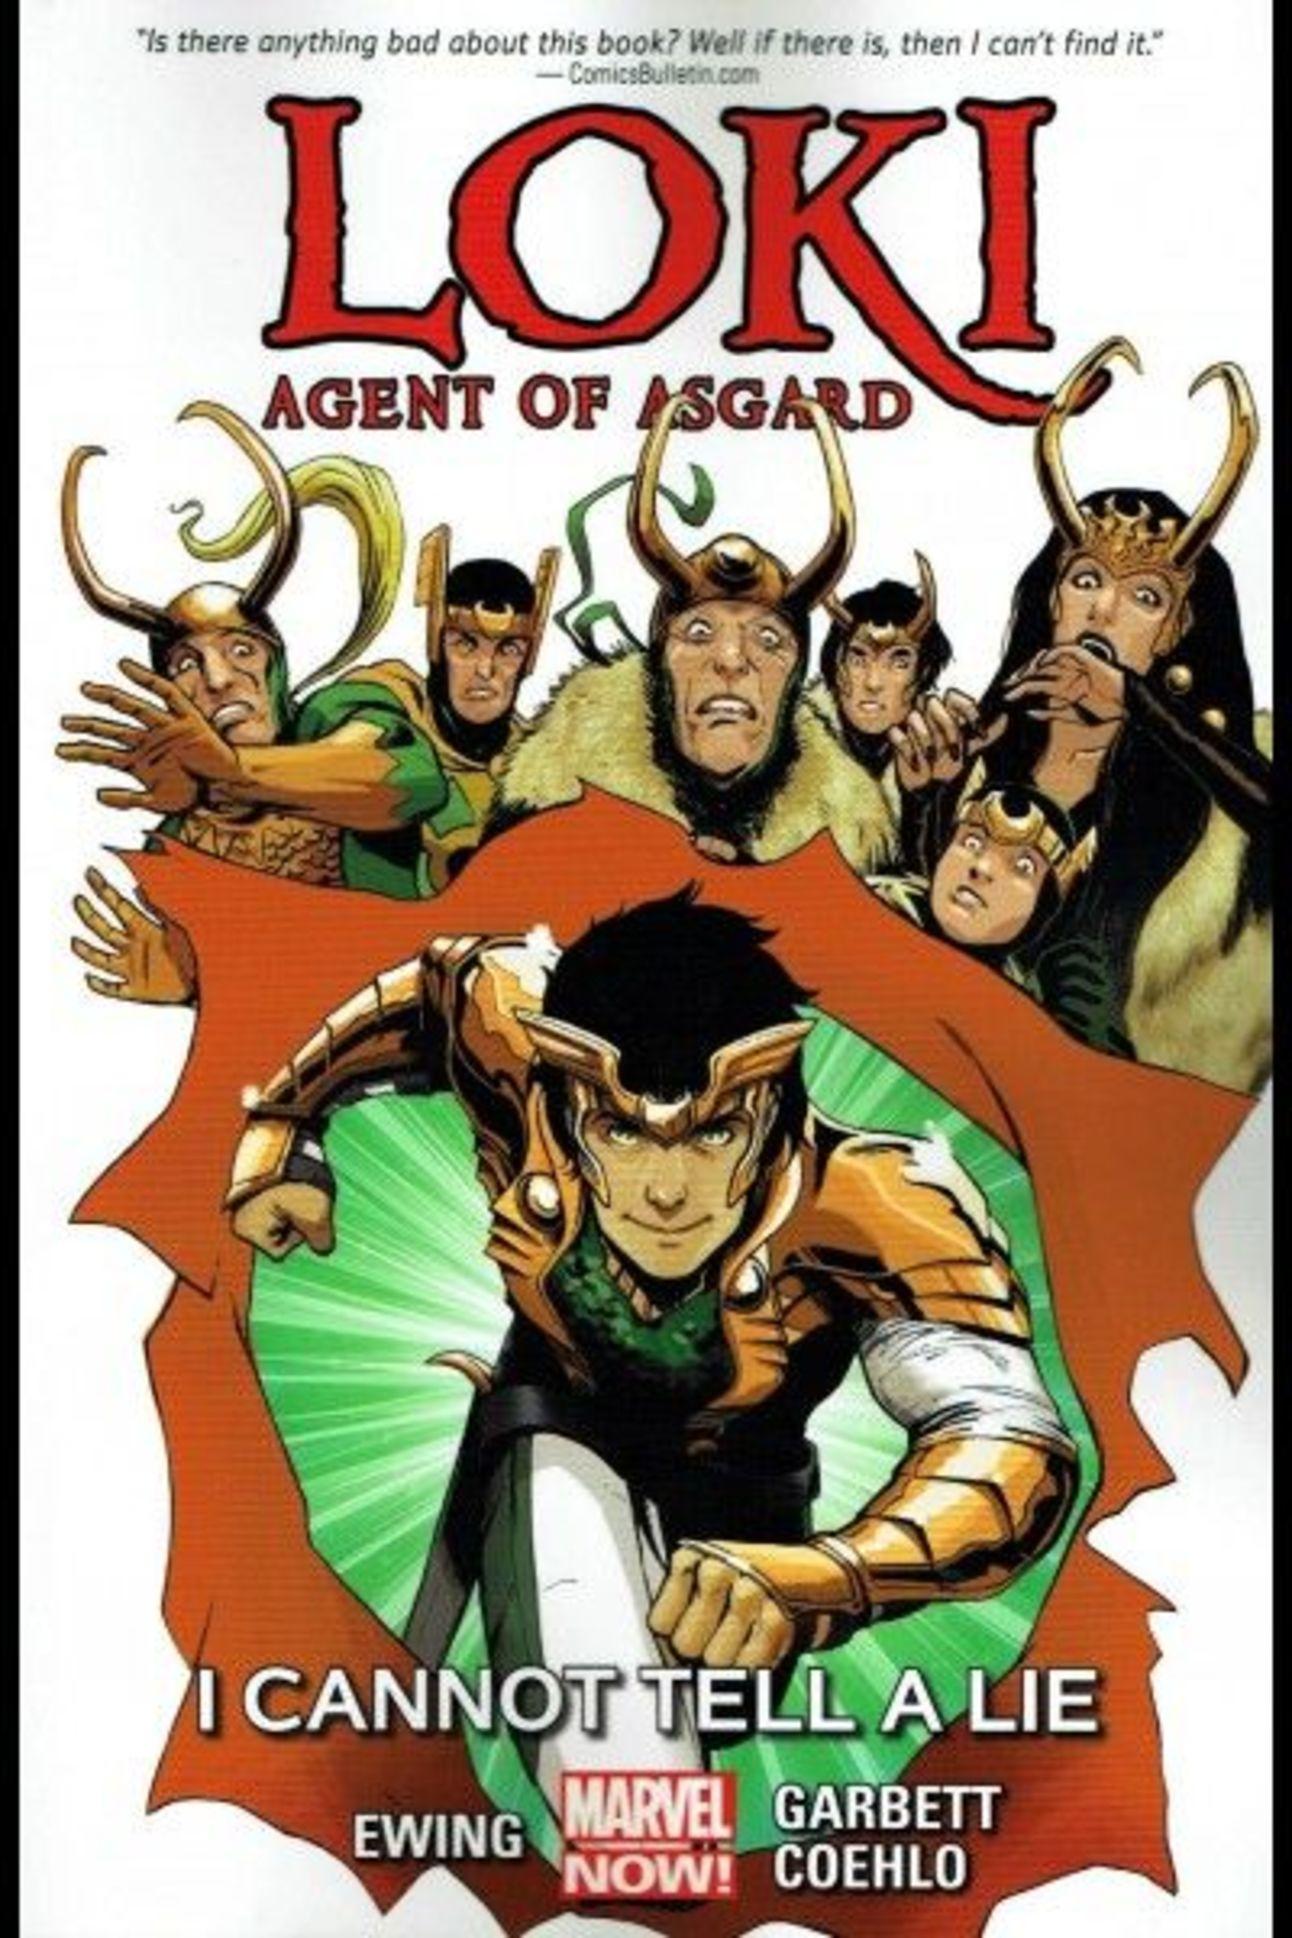 loki-agent-of-asgard-i-cannot-tell-a-lie